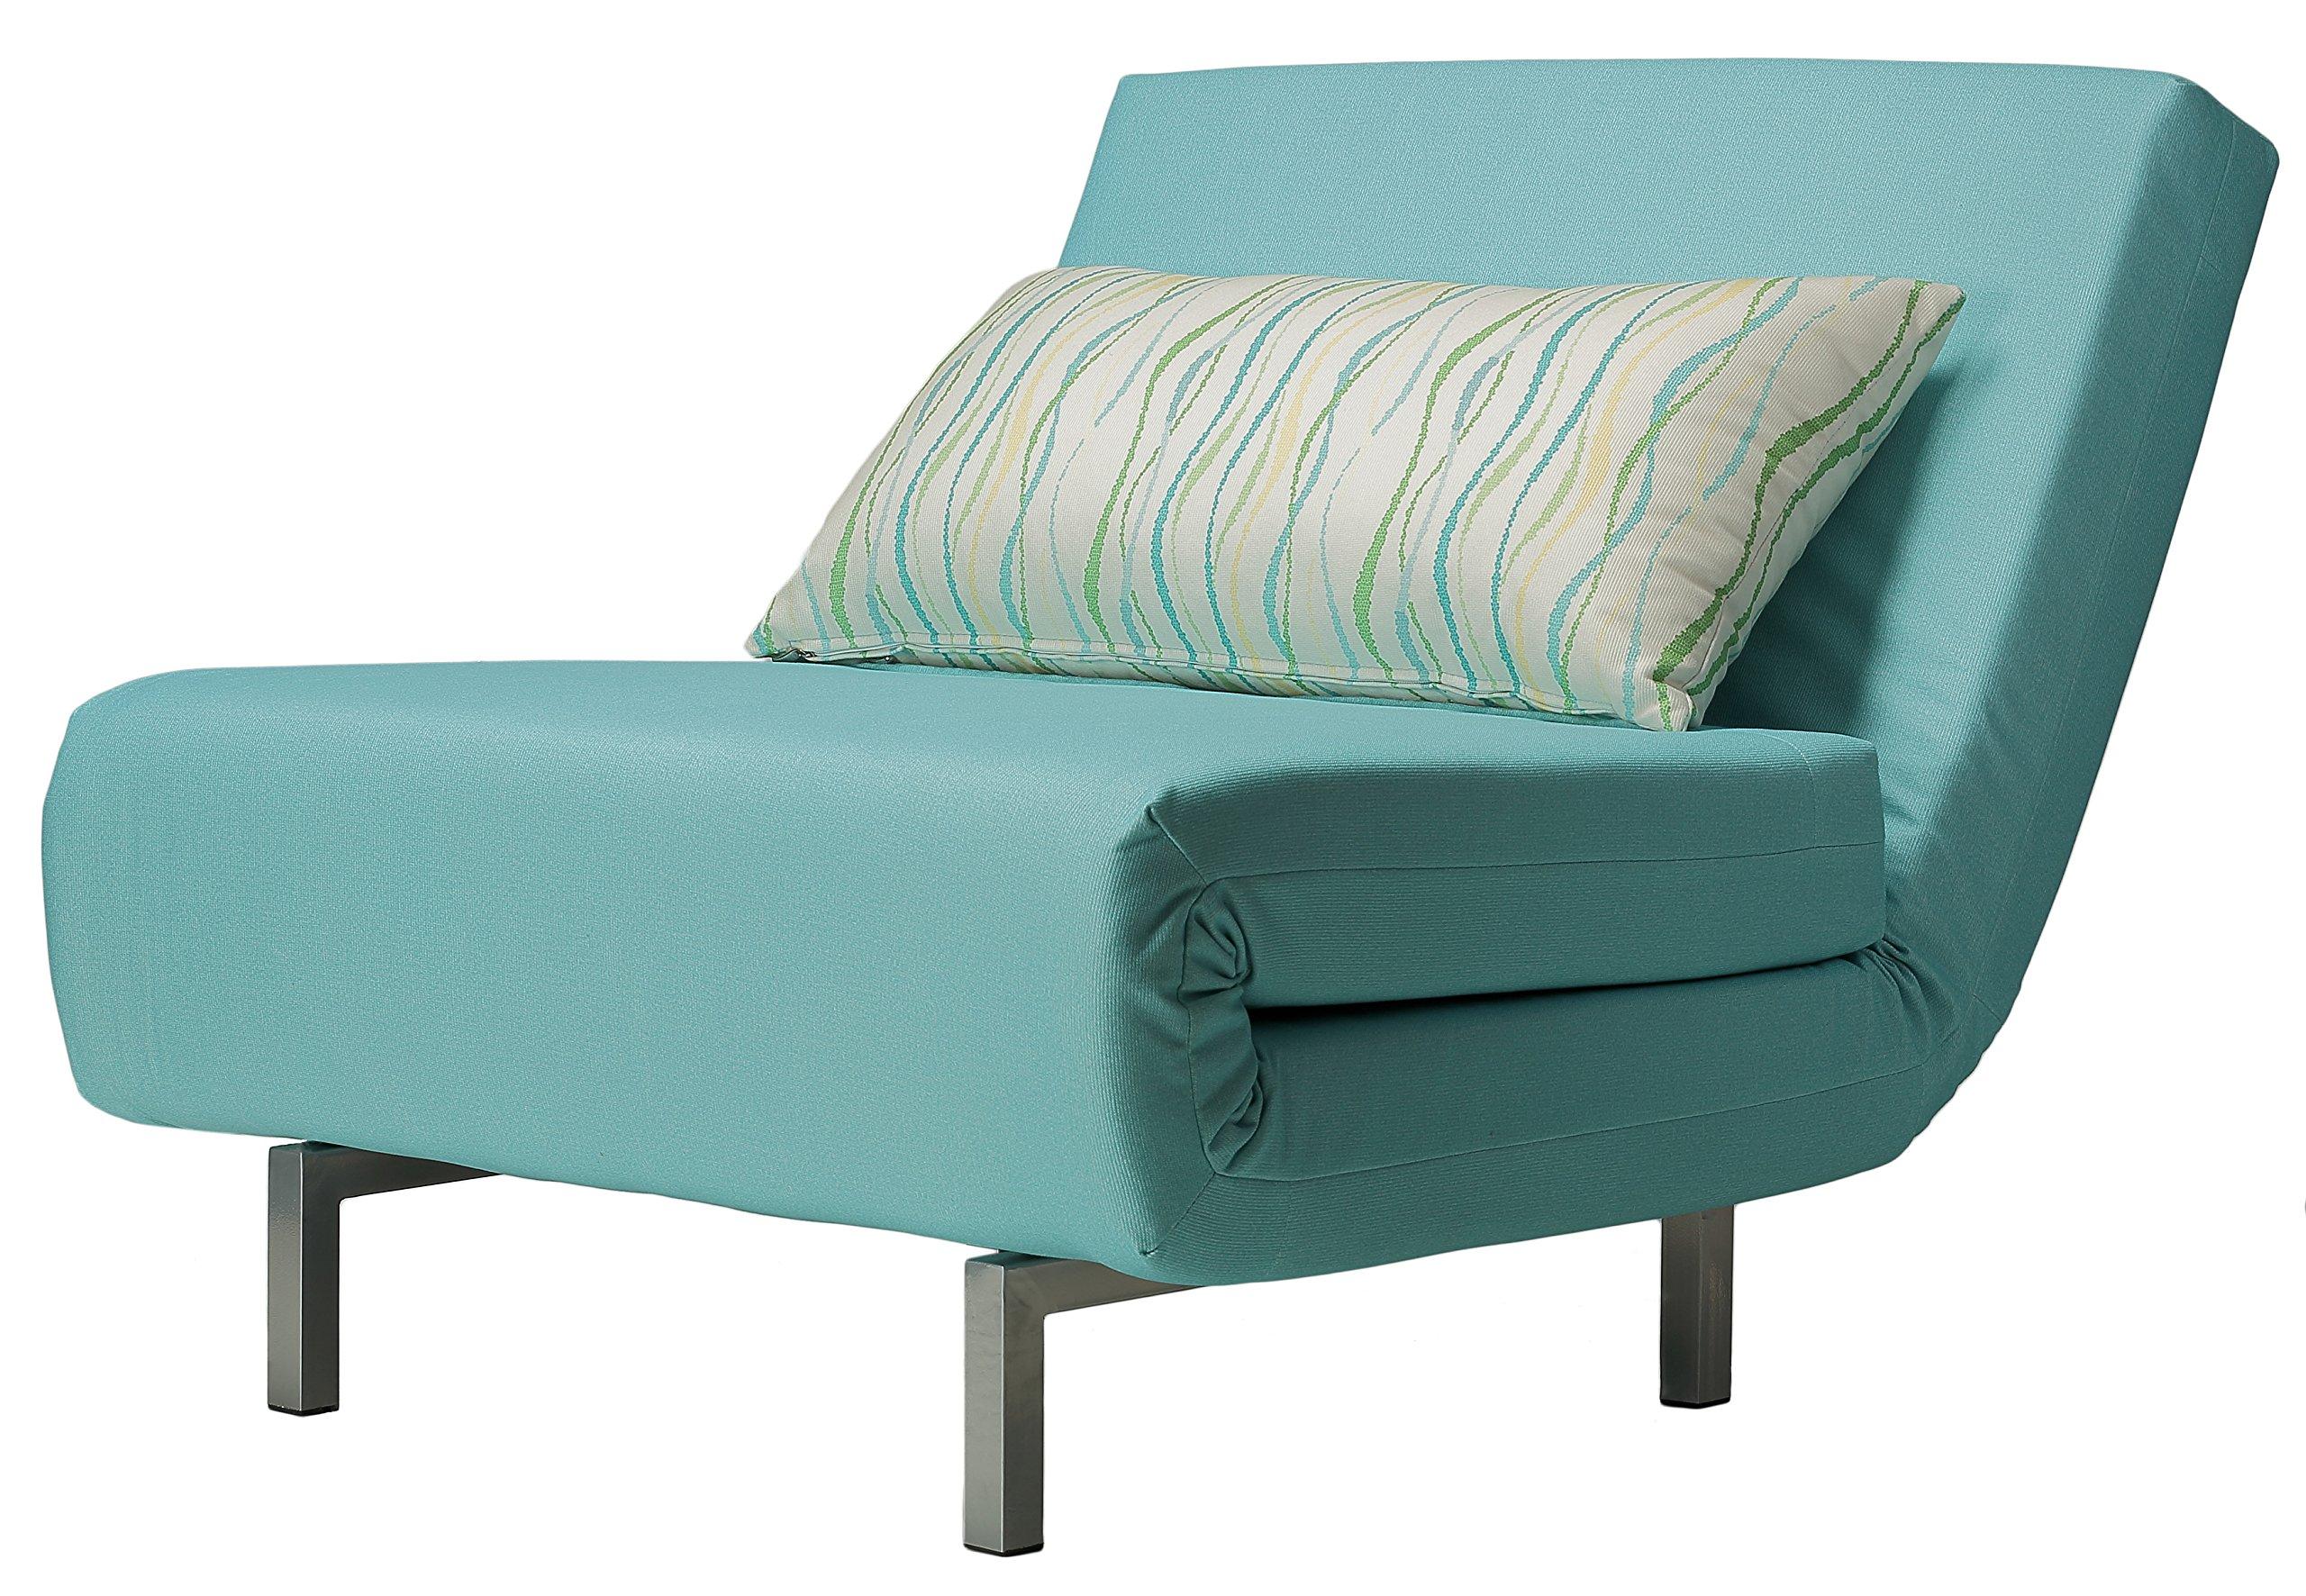 Cortesi Home Savion Convertible Accent Chair futon, Aqua Blue by Cortesi Home